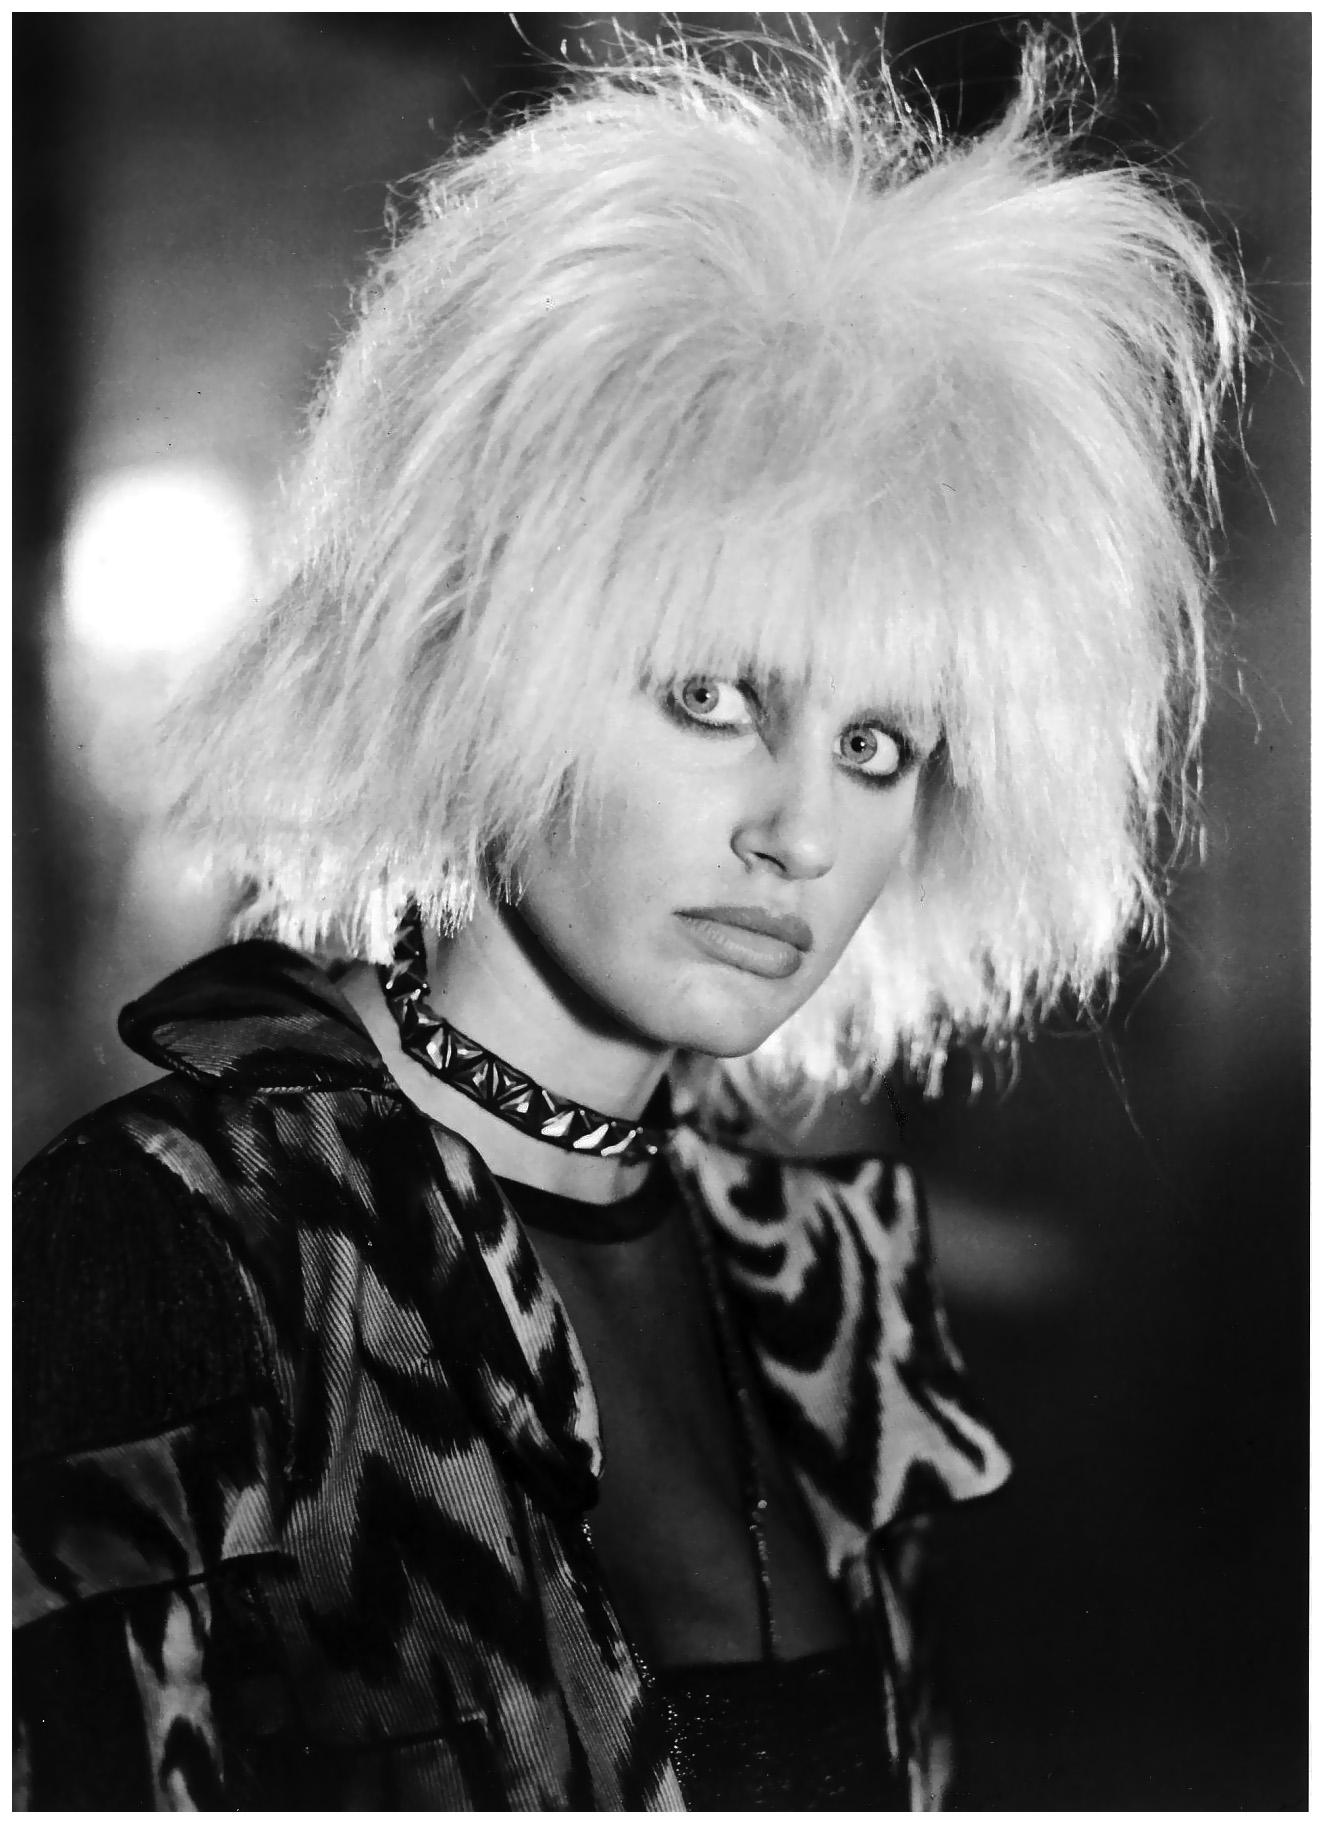 daryl hannah blade runner – Vogue – Photo Michael Comte 1992 © Pleasurephoto